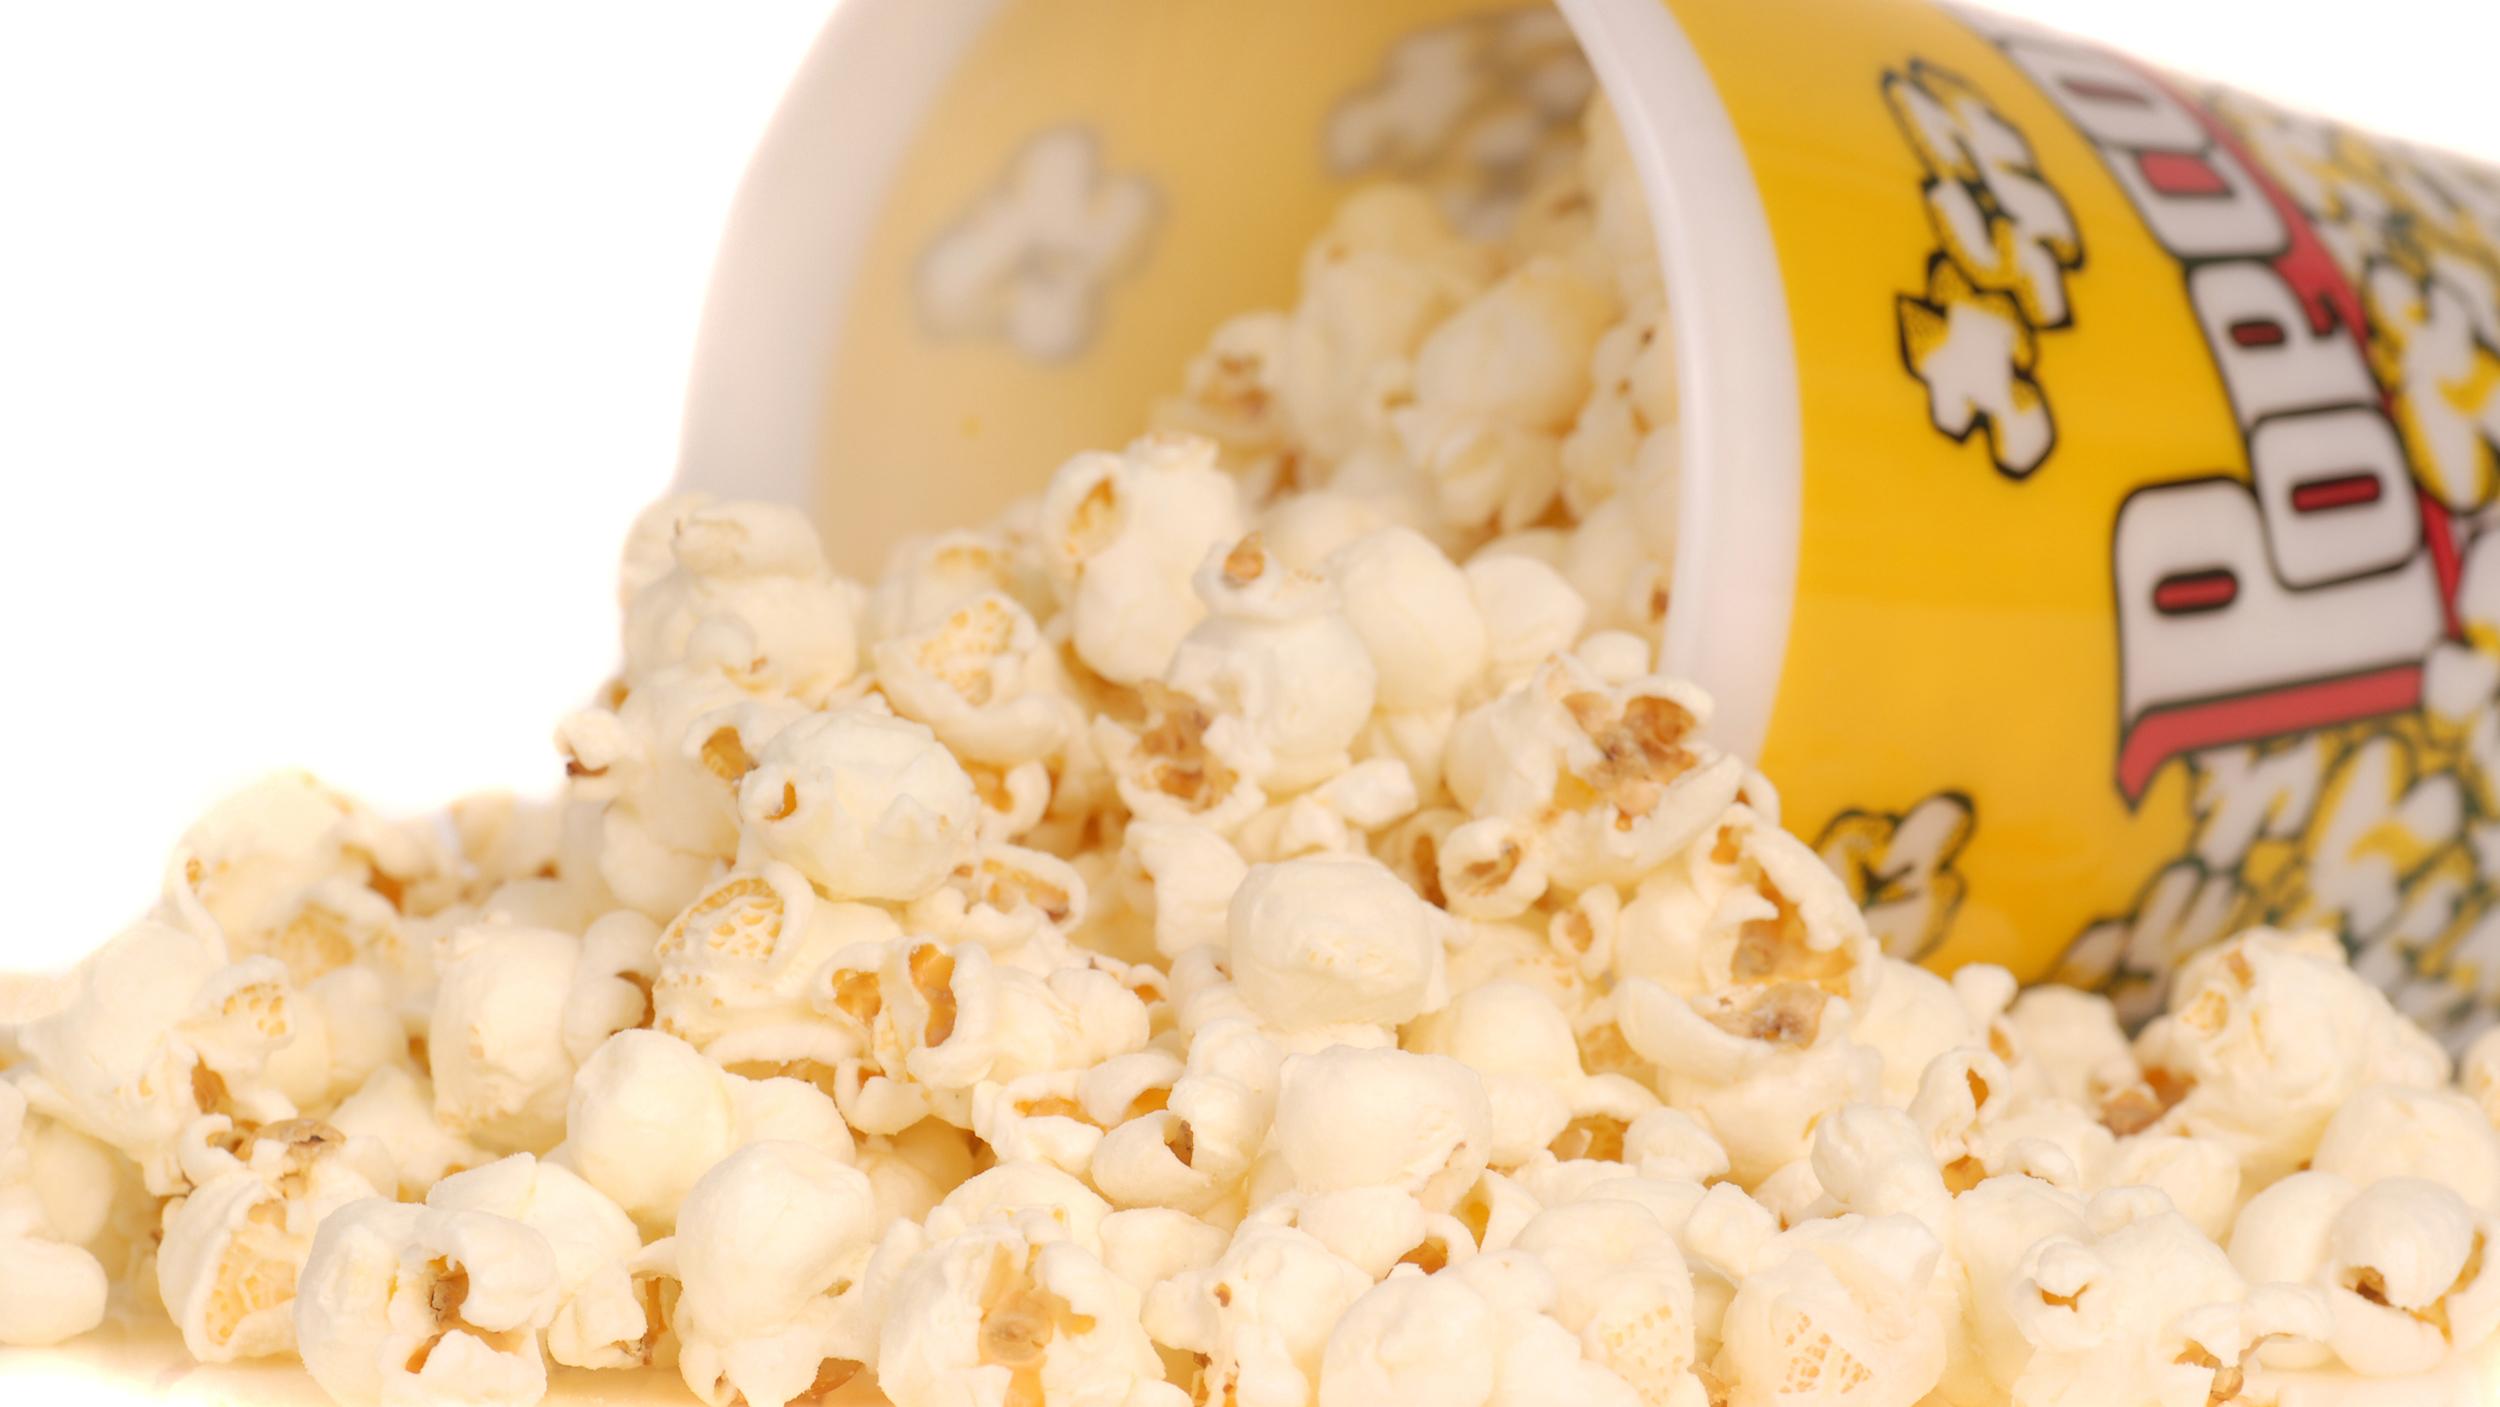 popcorn as healthy as veggies depends